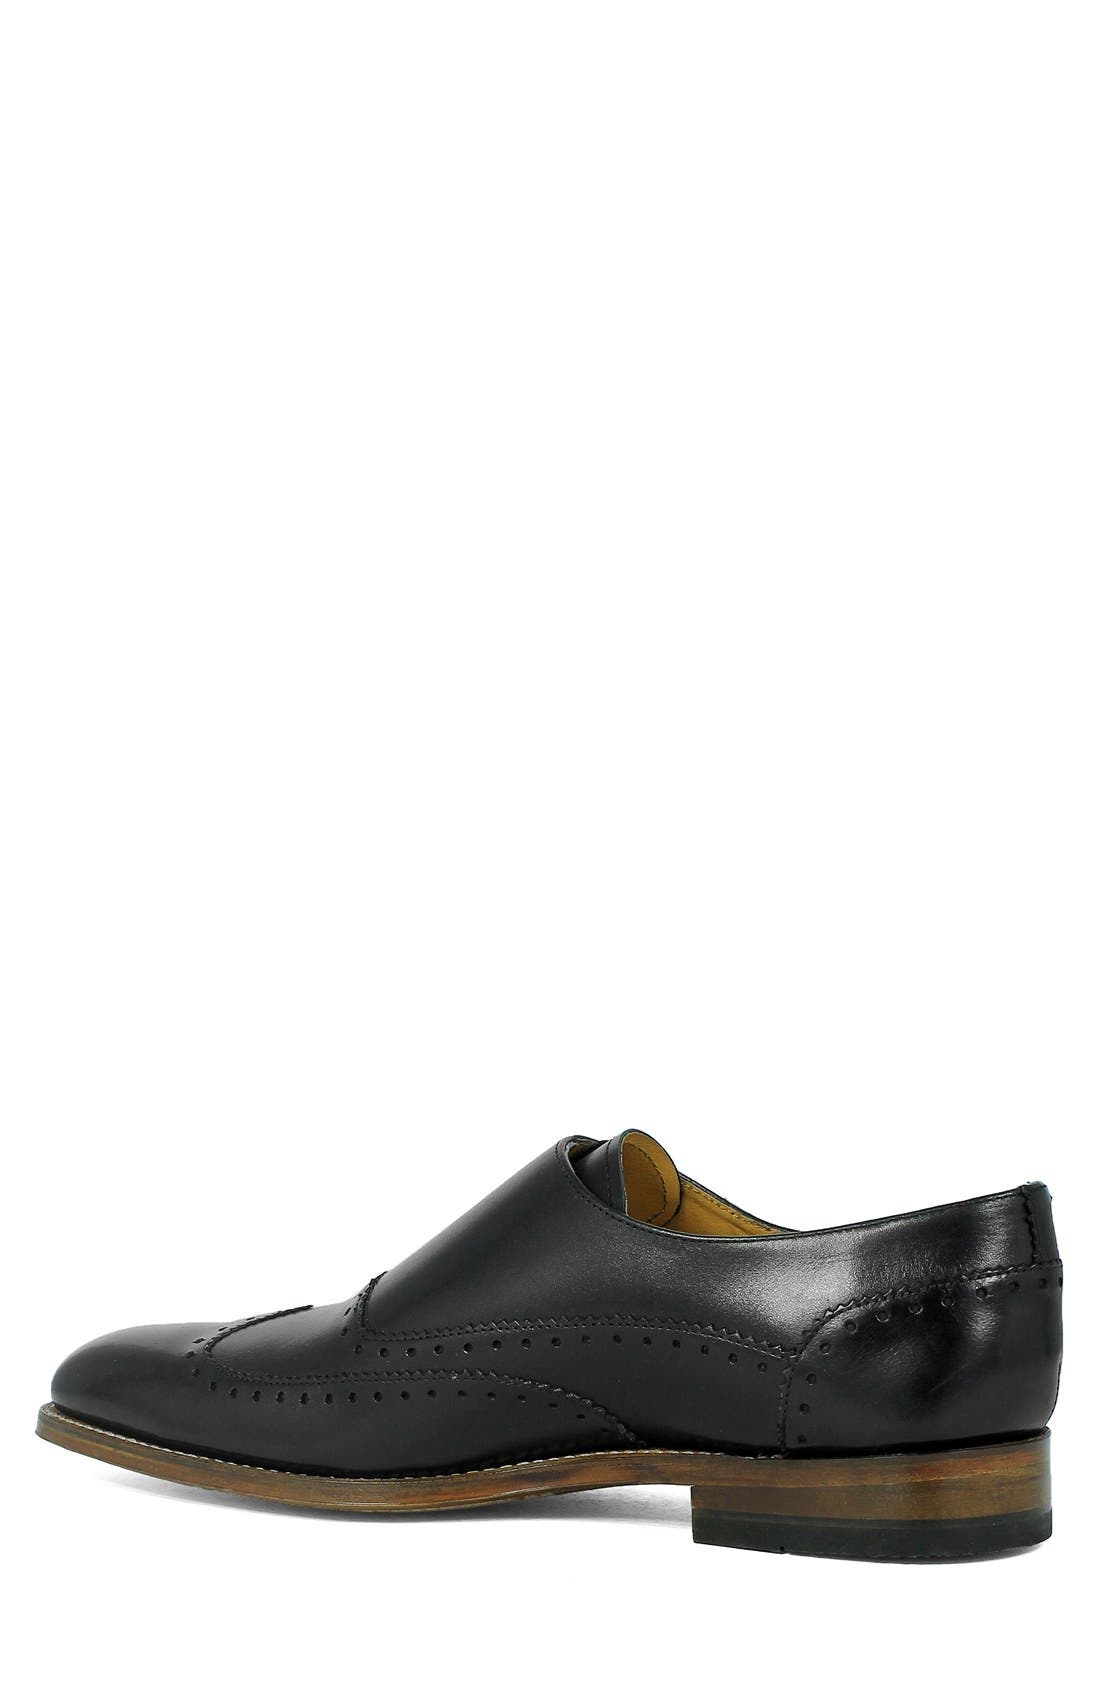 Madison II Monk Strap Shoe,                             Alternate thumbnail 2, color,                             Black